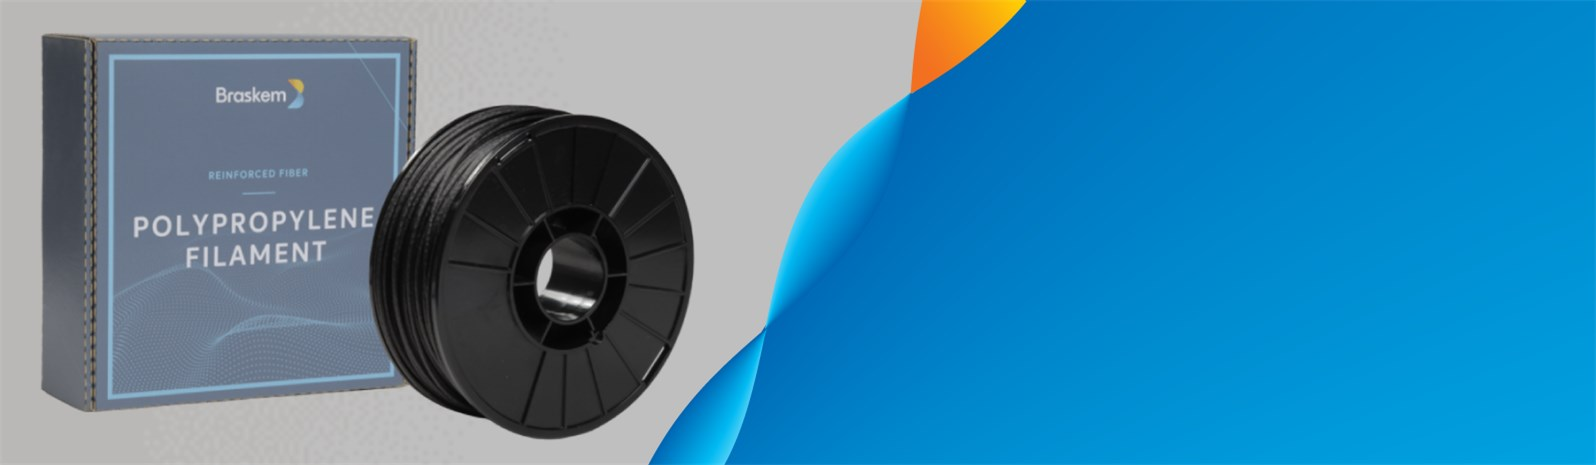 Braskem's carbon fiber reinforced PP filament is available on the Ultimaker Marketplace.